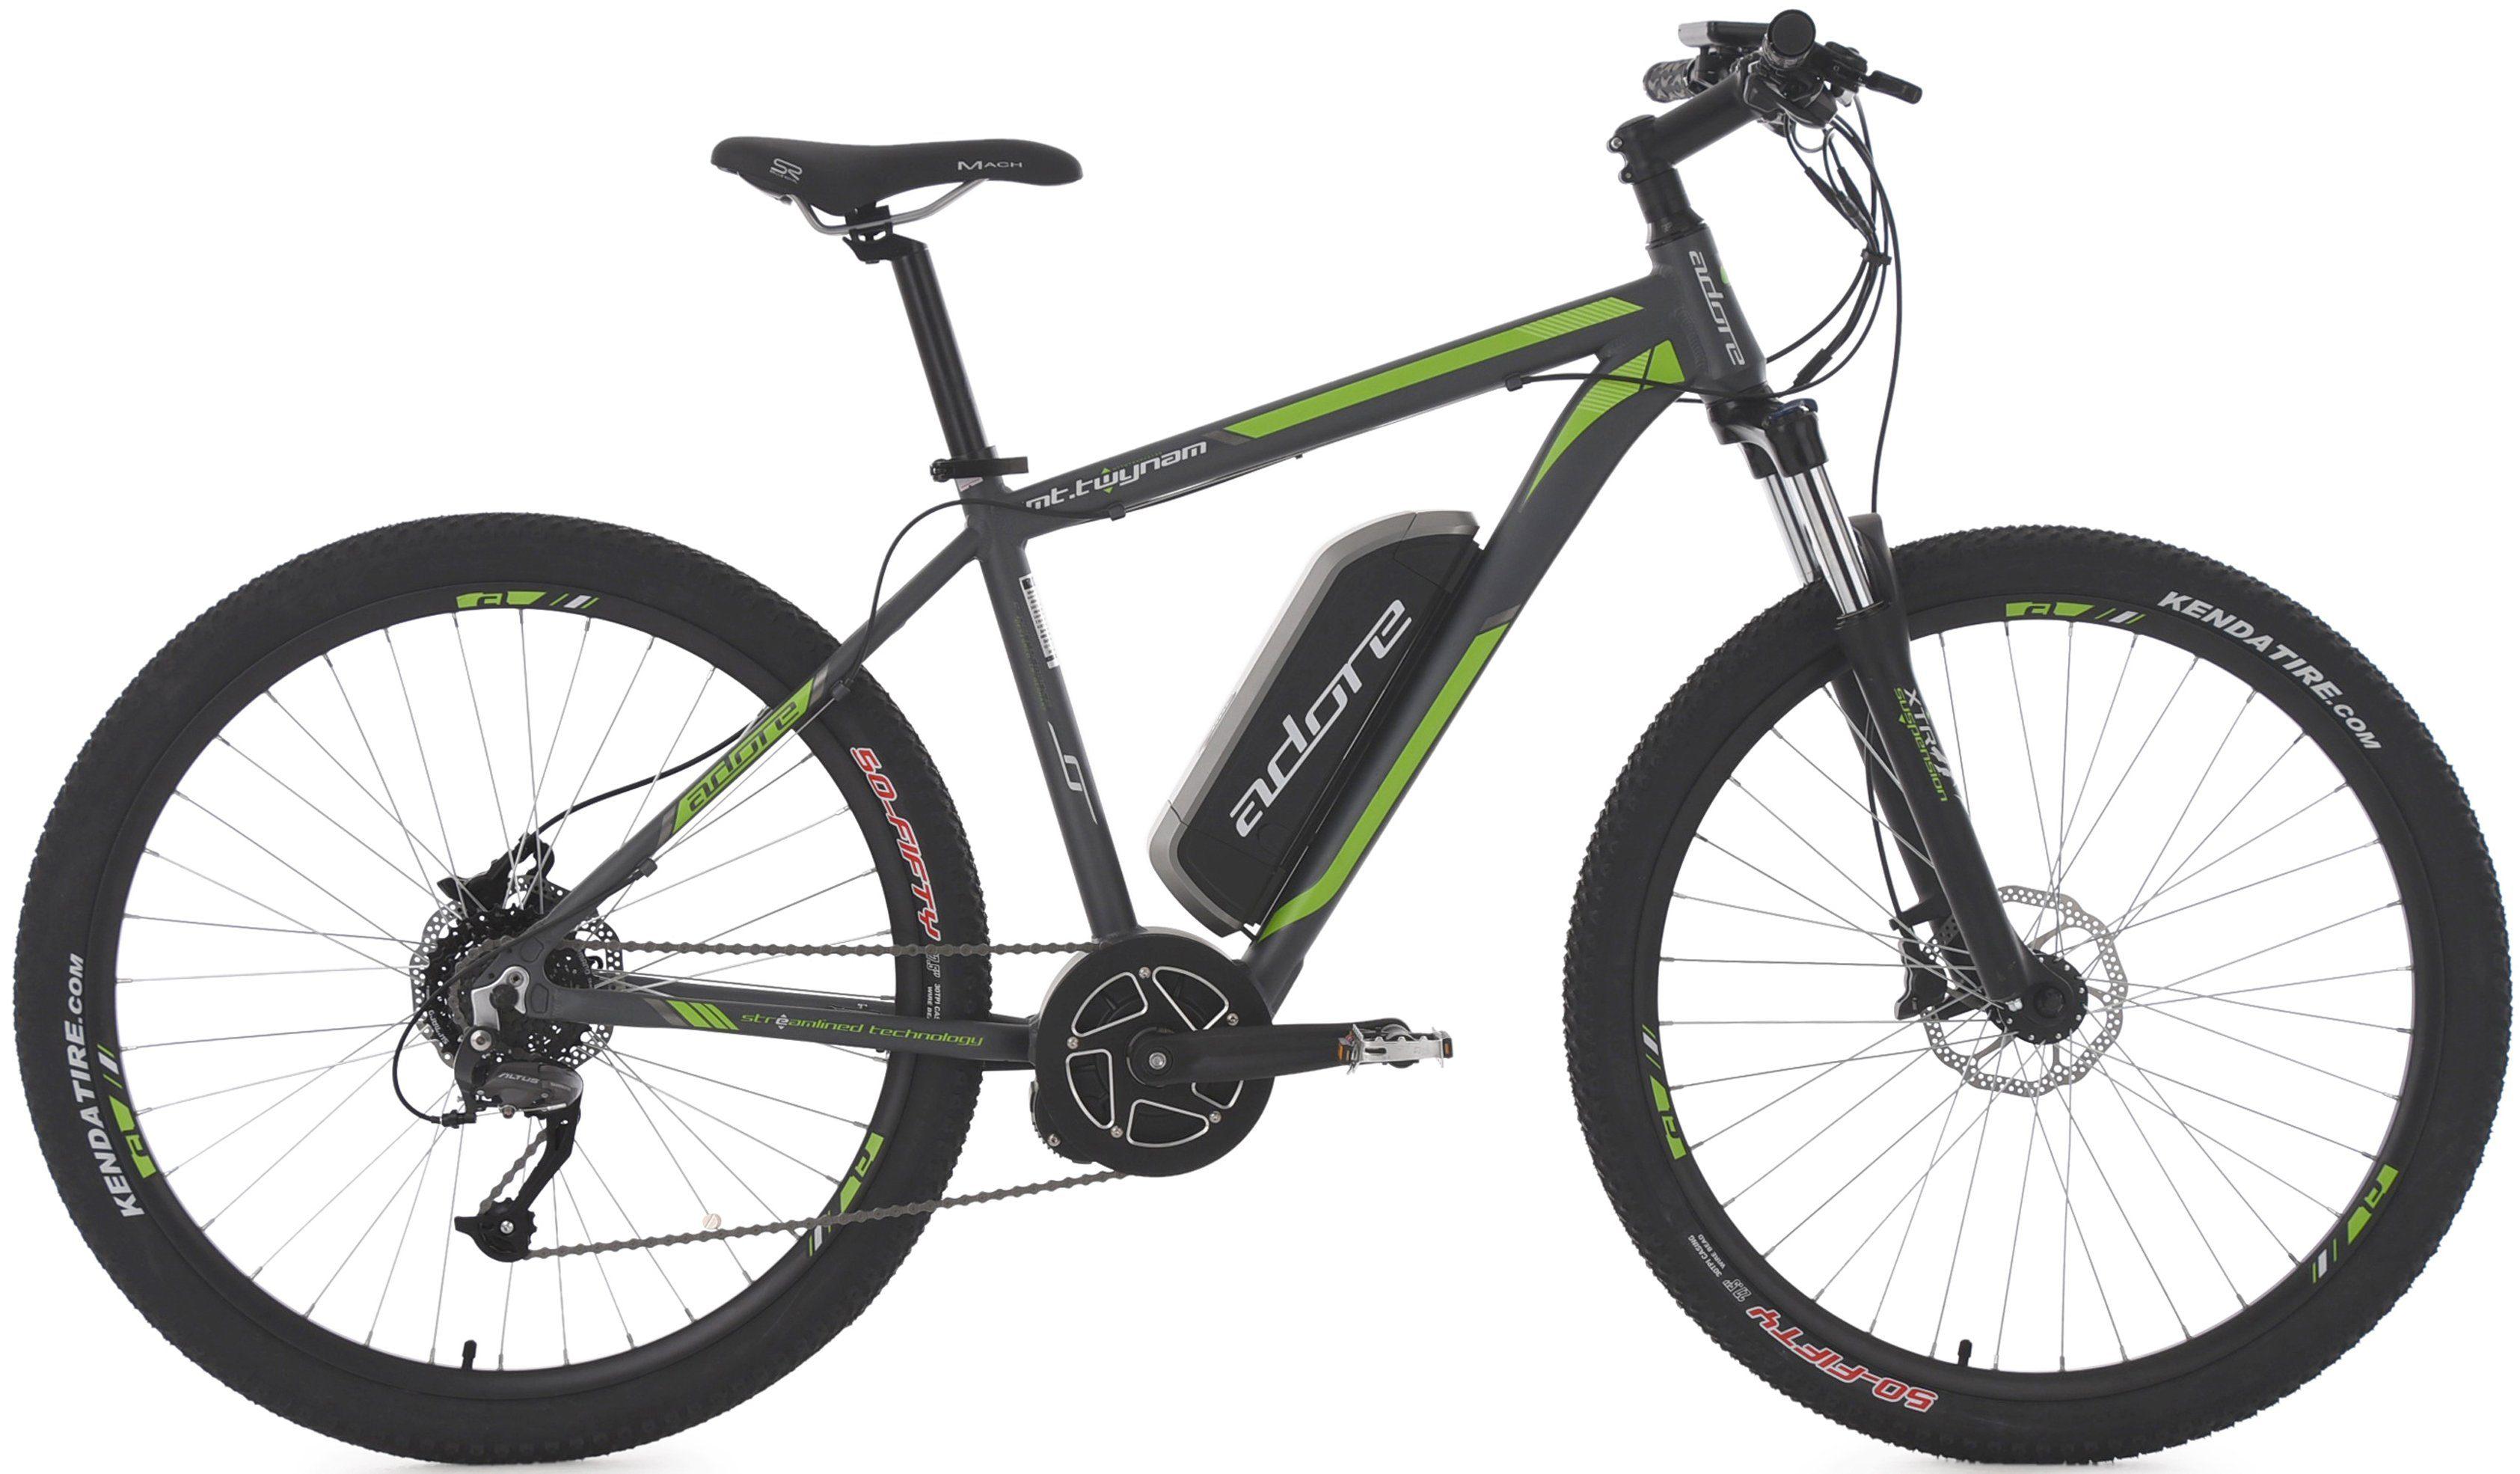 Adore MTB E-Bike, 27,5 Zoll, 9 Gang Shimano Altus, Mittelmotor, 374 W, 36V/10,4 Ah, »Twynam«